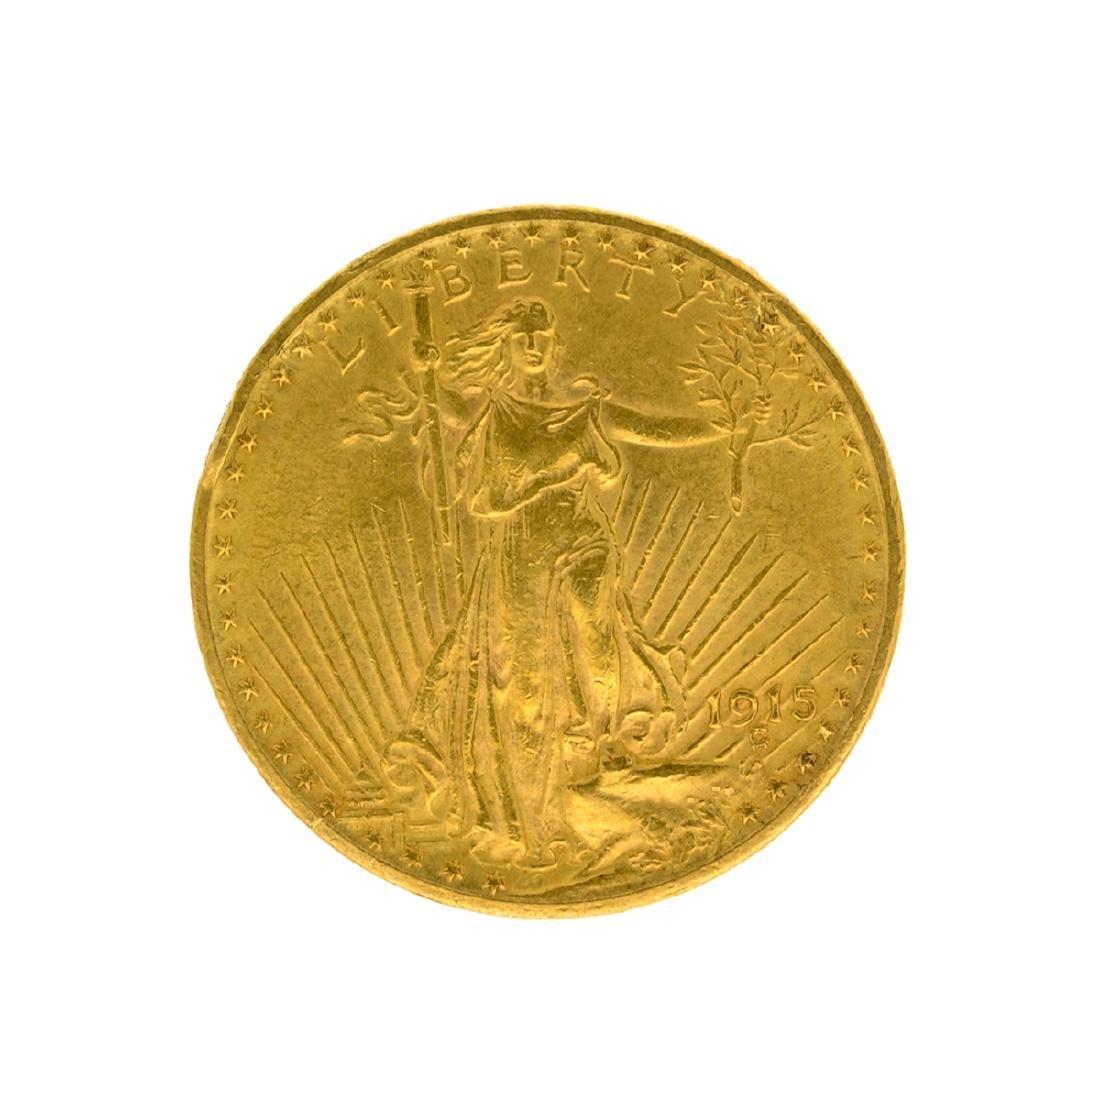 1915 $20 St. Gaudens U.S. Gold Coin